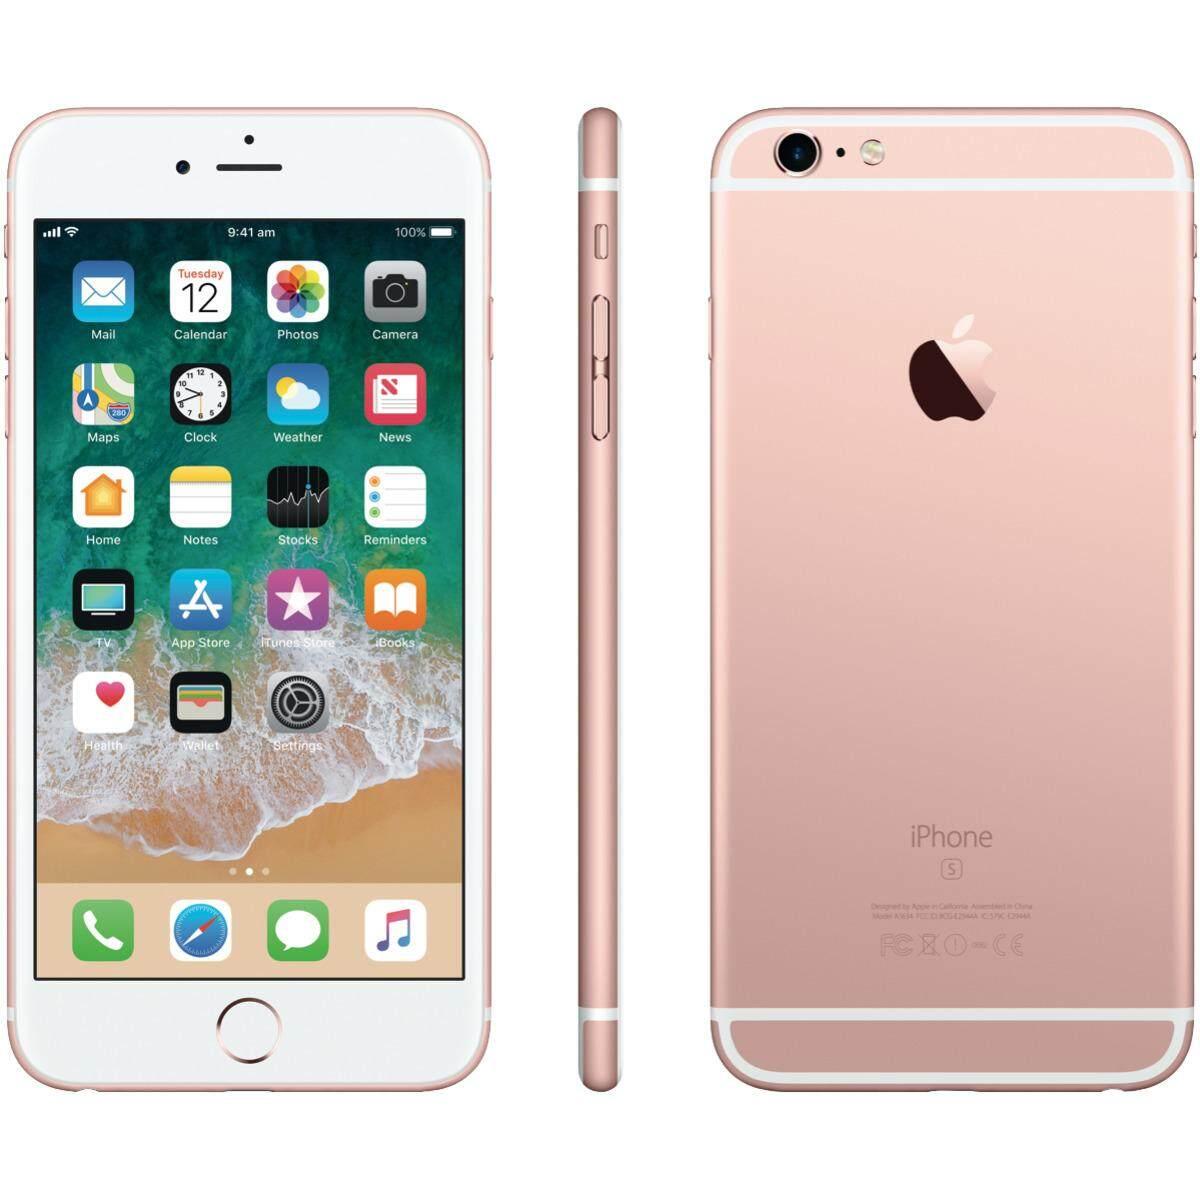 Apple iPhone 6s PLUS 64GB (Rose Gold) ประกัน 6 เดือน